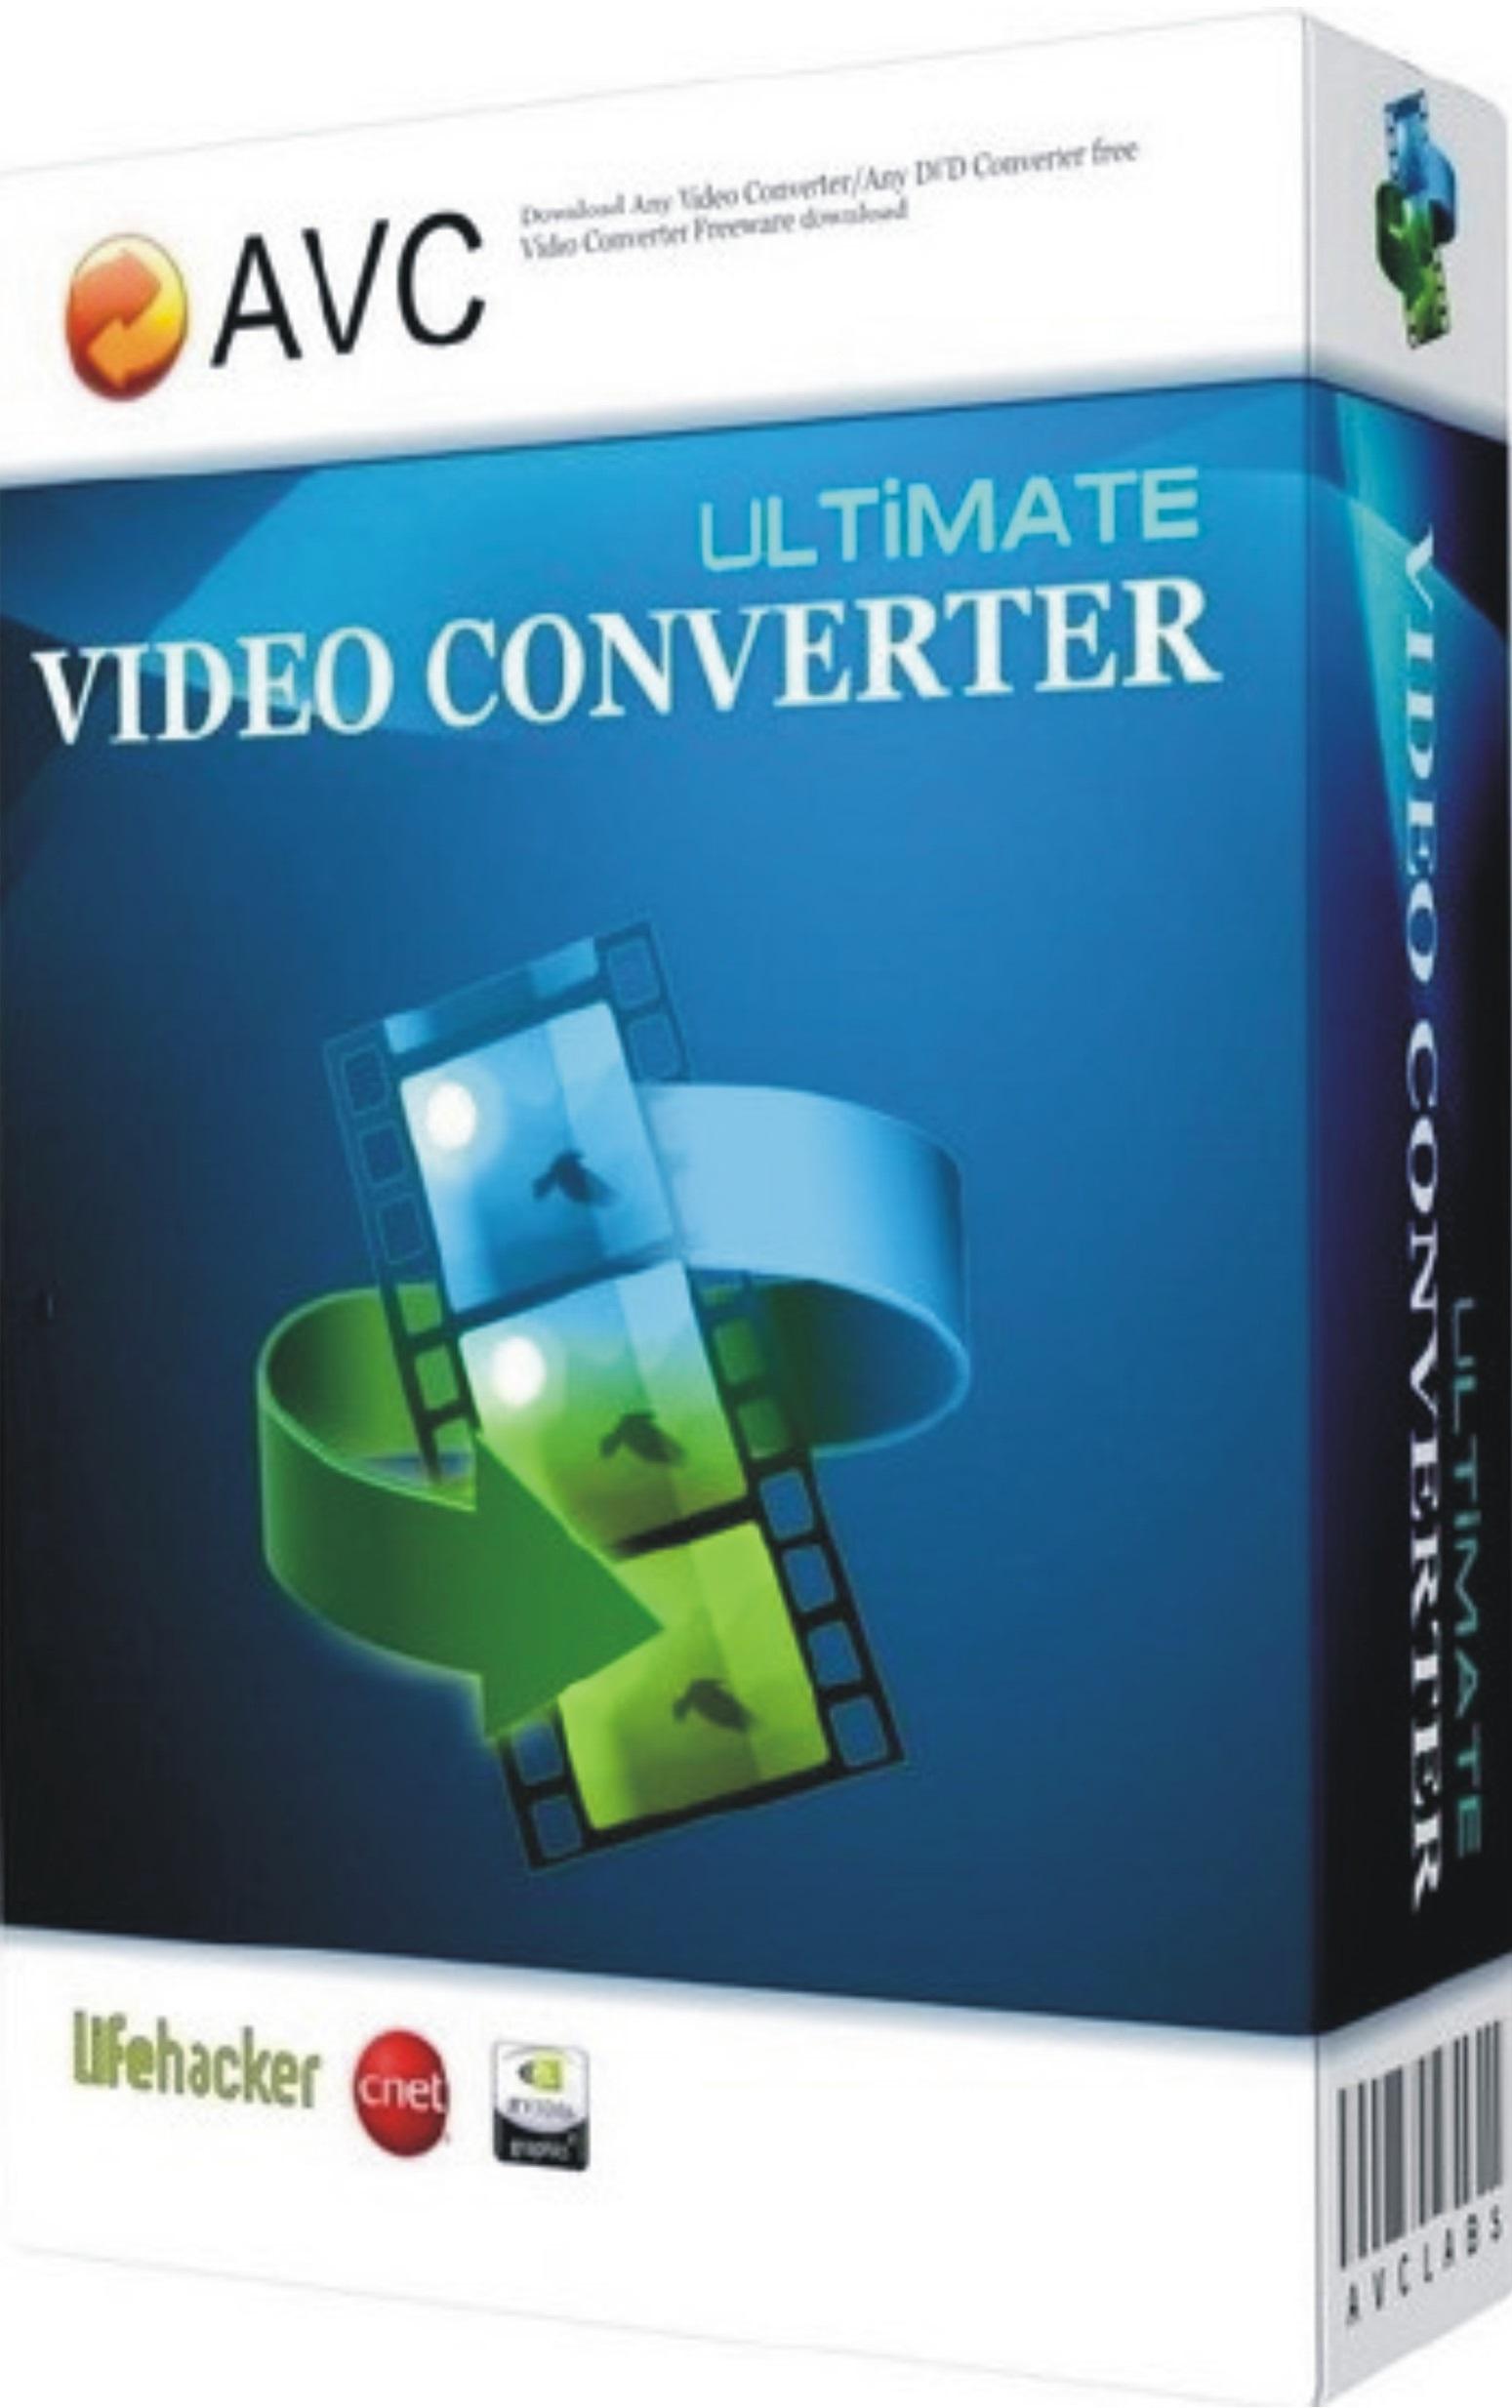 Any Video Converter Ultimate 6.2.1 Crack + License Key Download